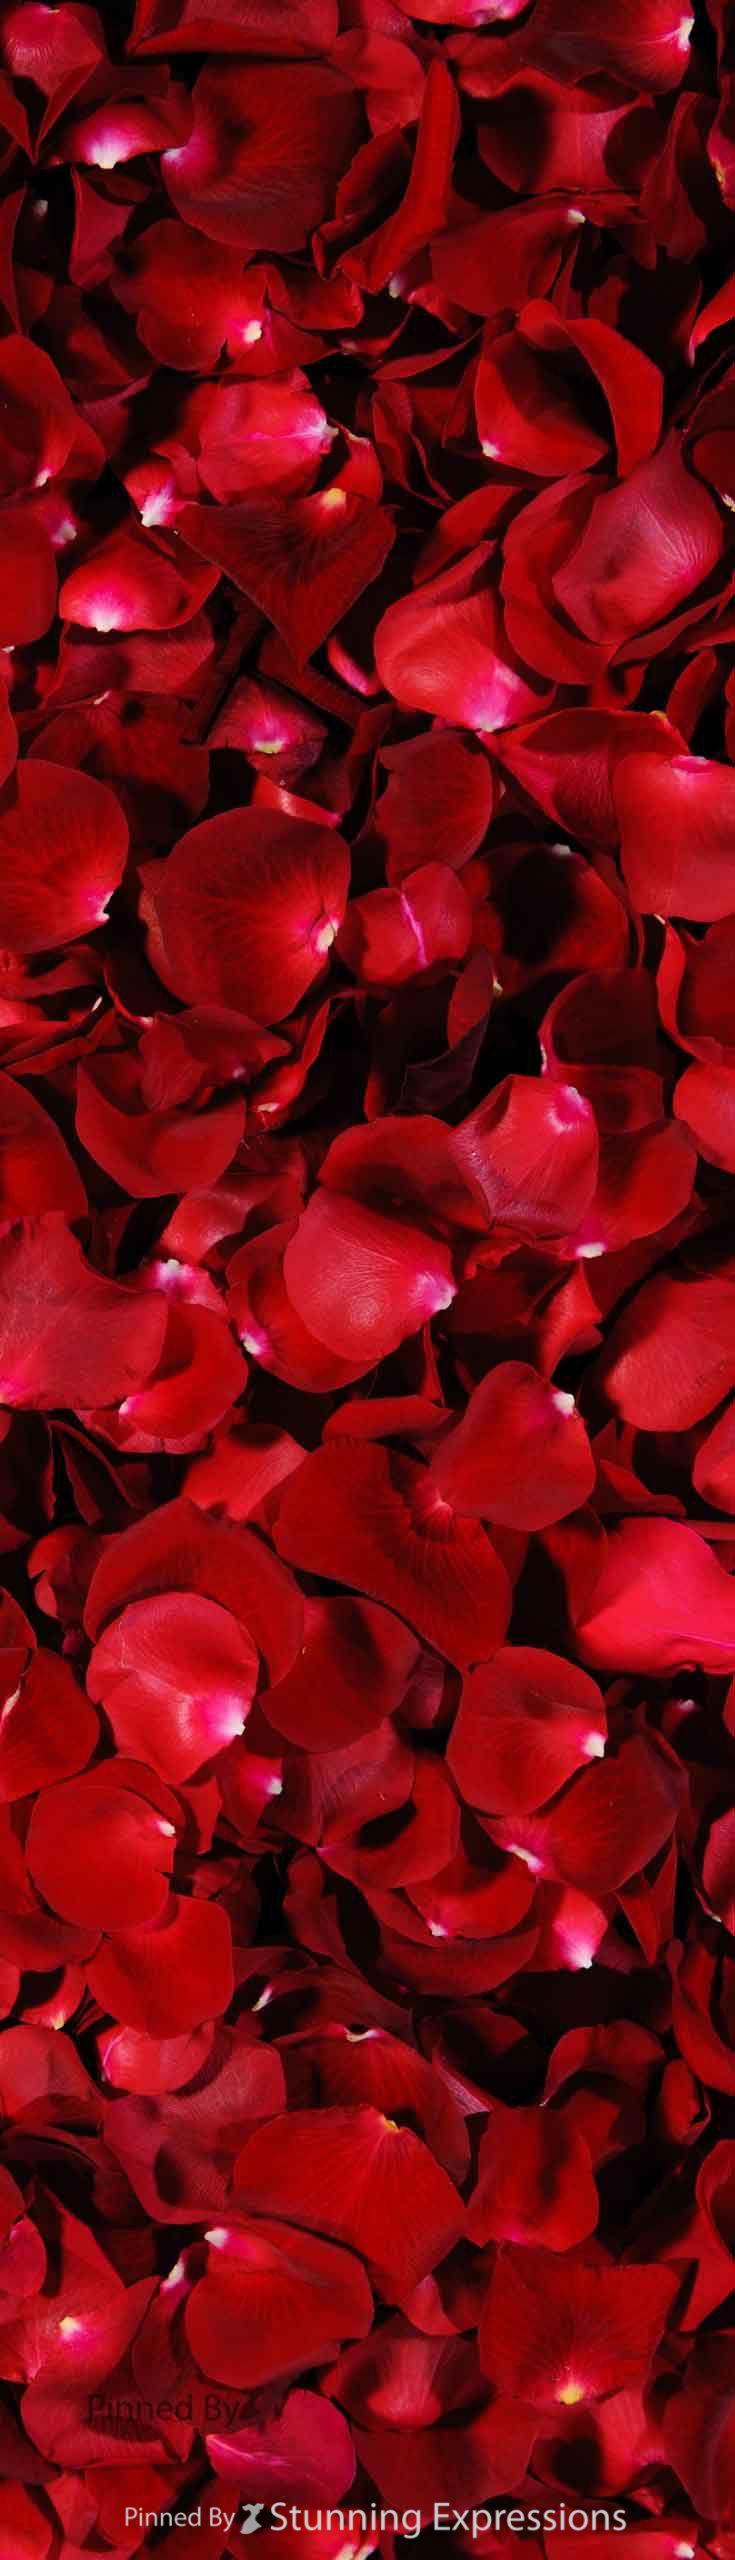 best 25 red rose petals ideas on pinterest red wedding Wedding Reception Centerpiece Ideas Red Wedding Flower Centerpieces